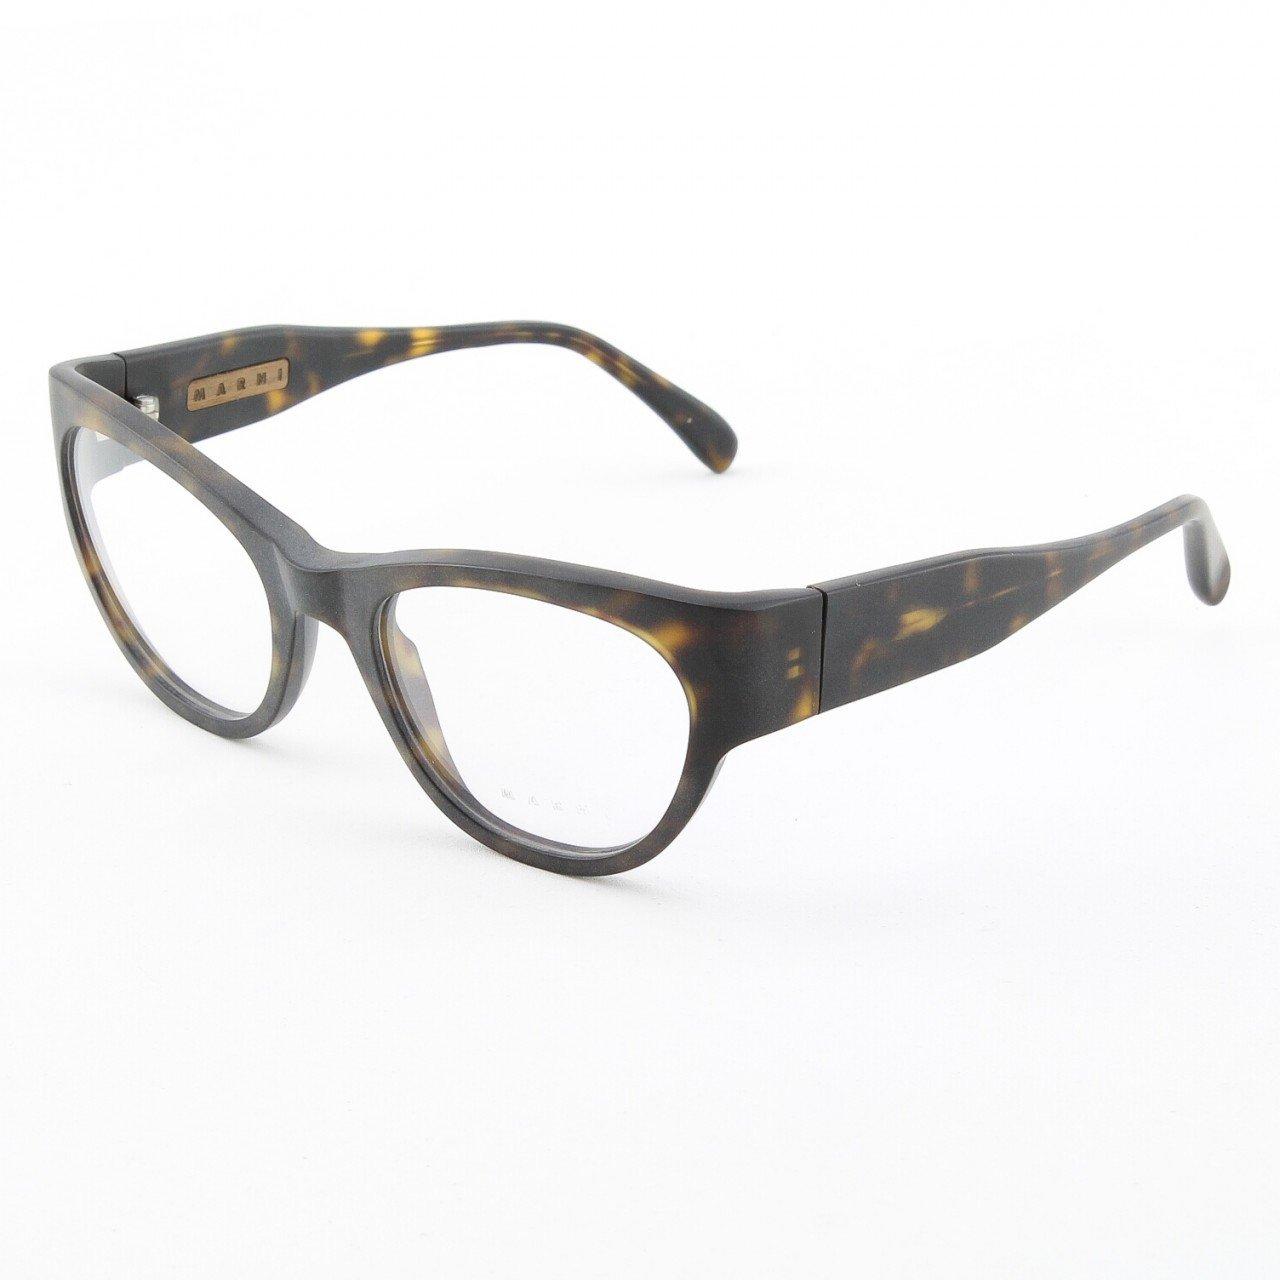 Marni MA683S Eyeglasses Col. 08 Black Tortoise Matte with Clear Lenses